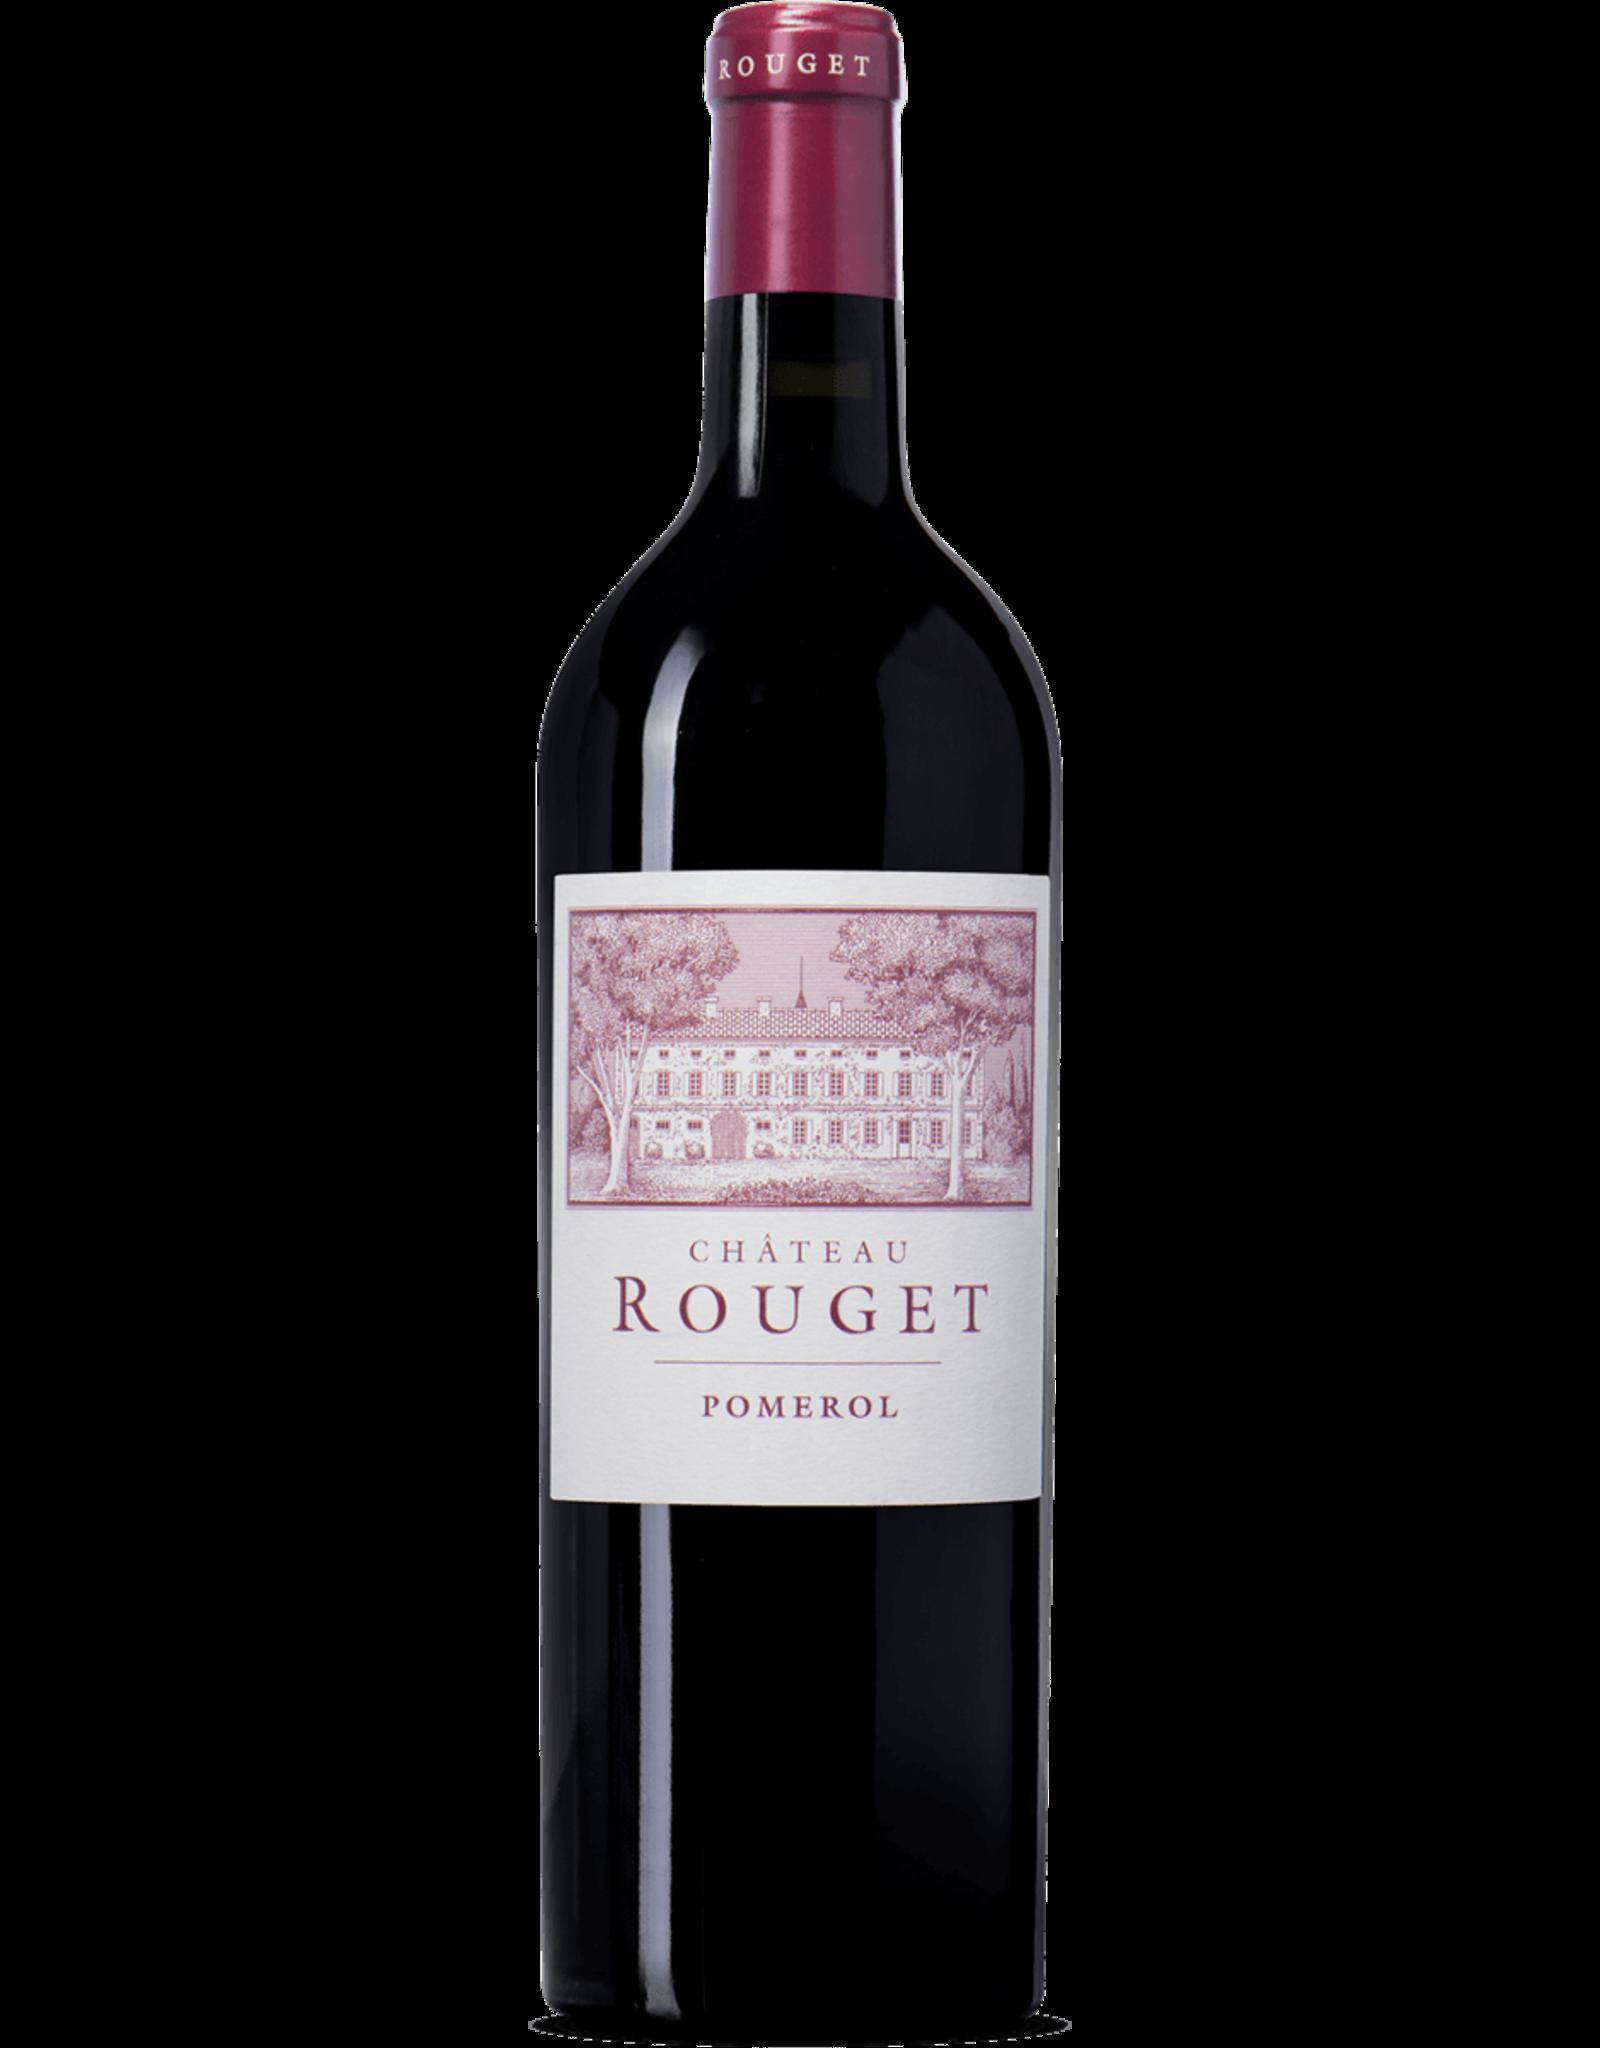 Château Rouget Château Rouget 2017 - Pomerol